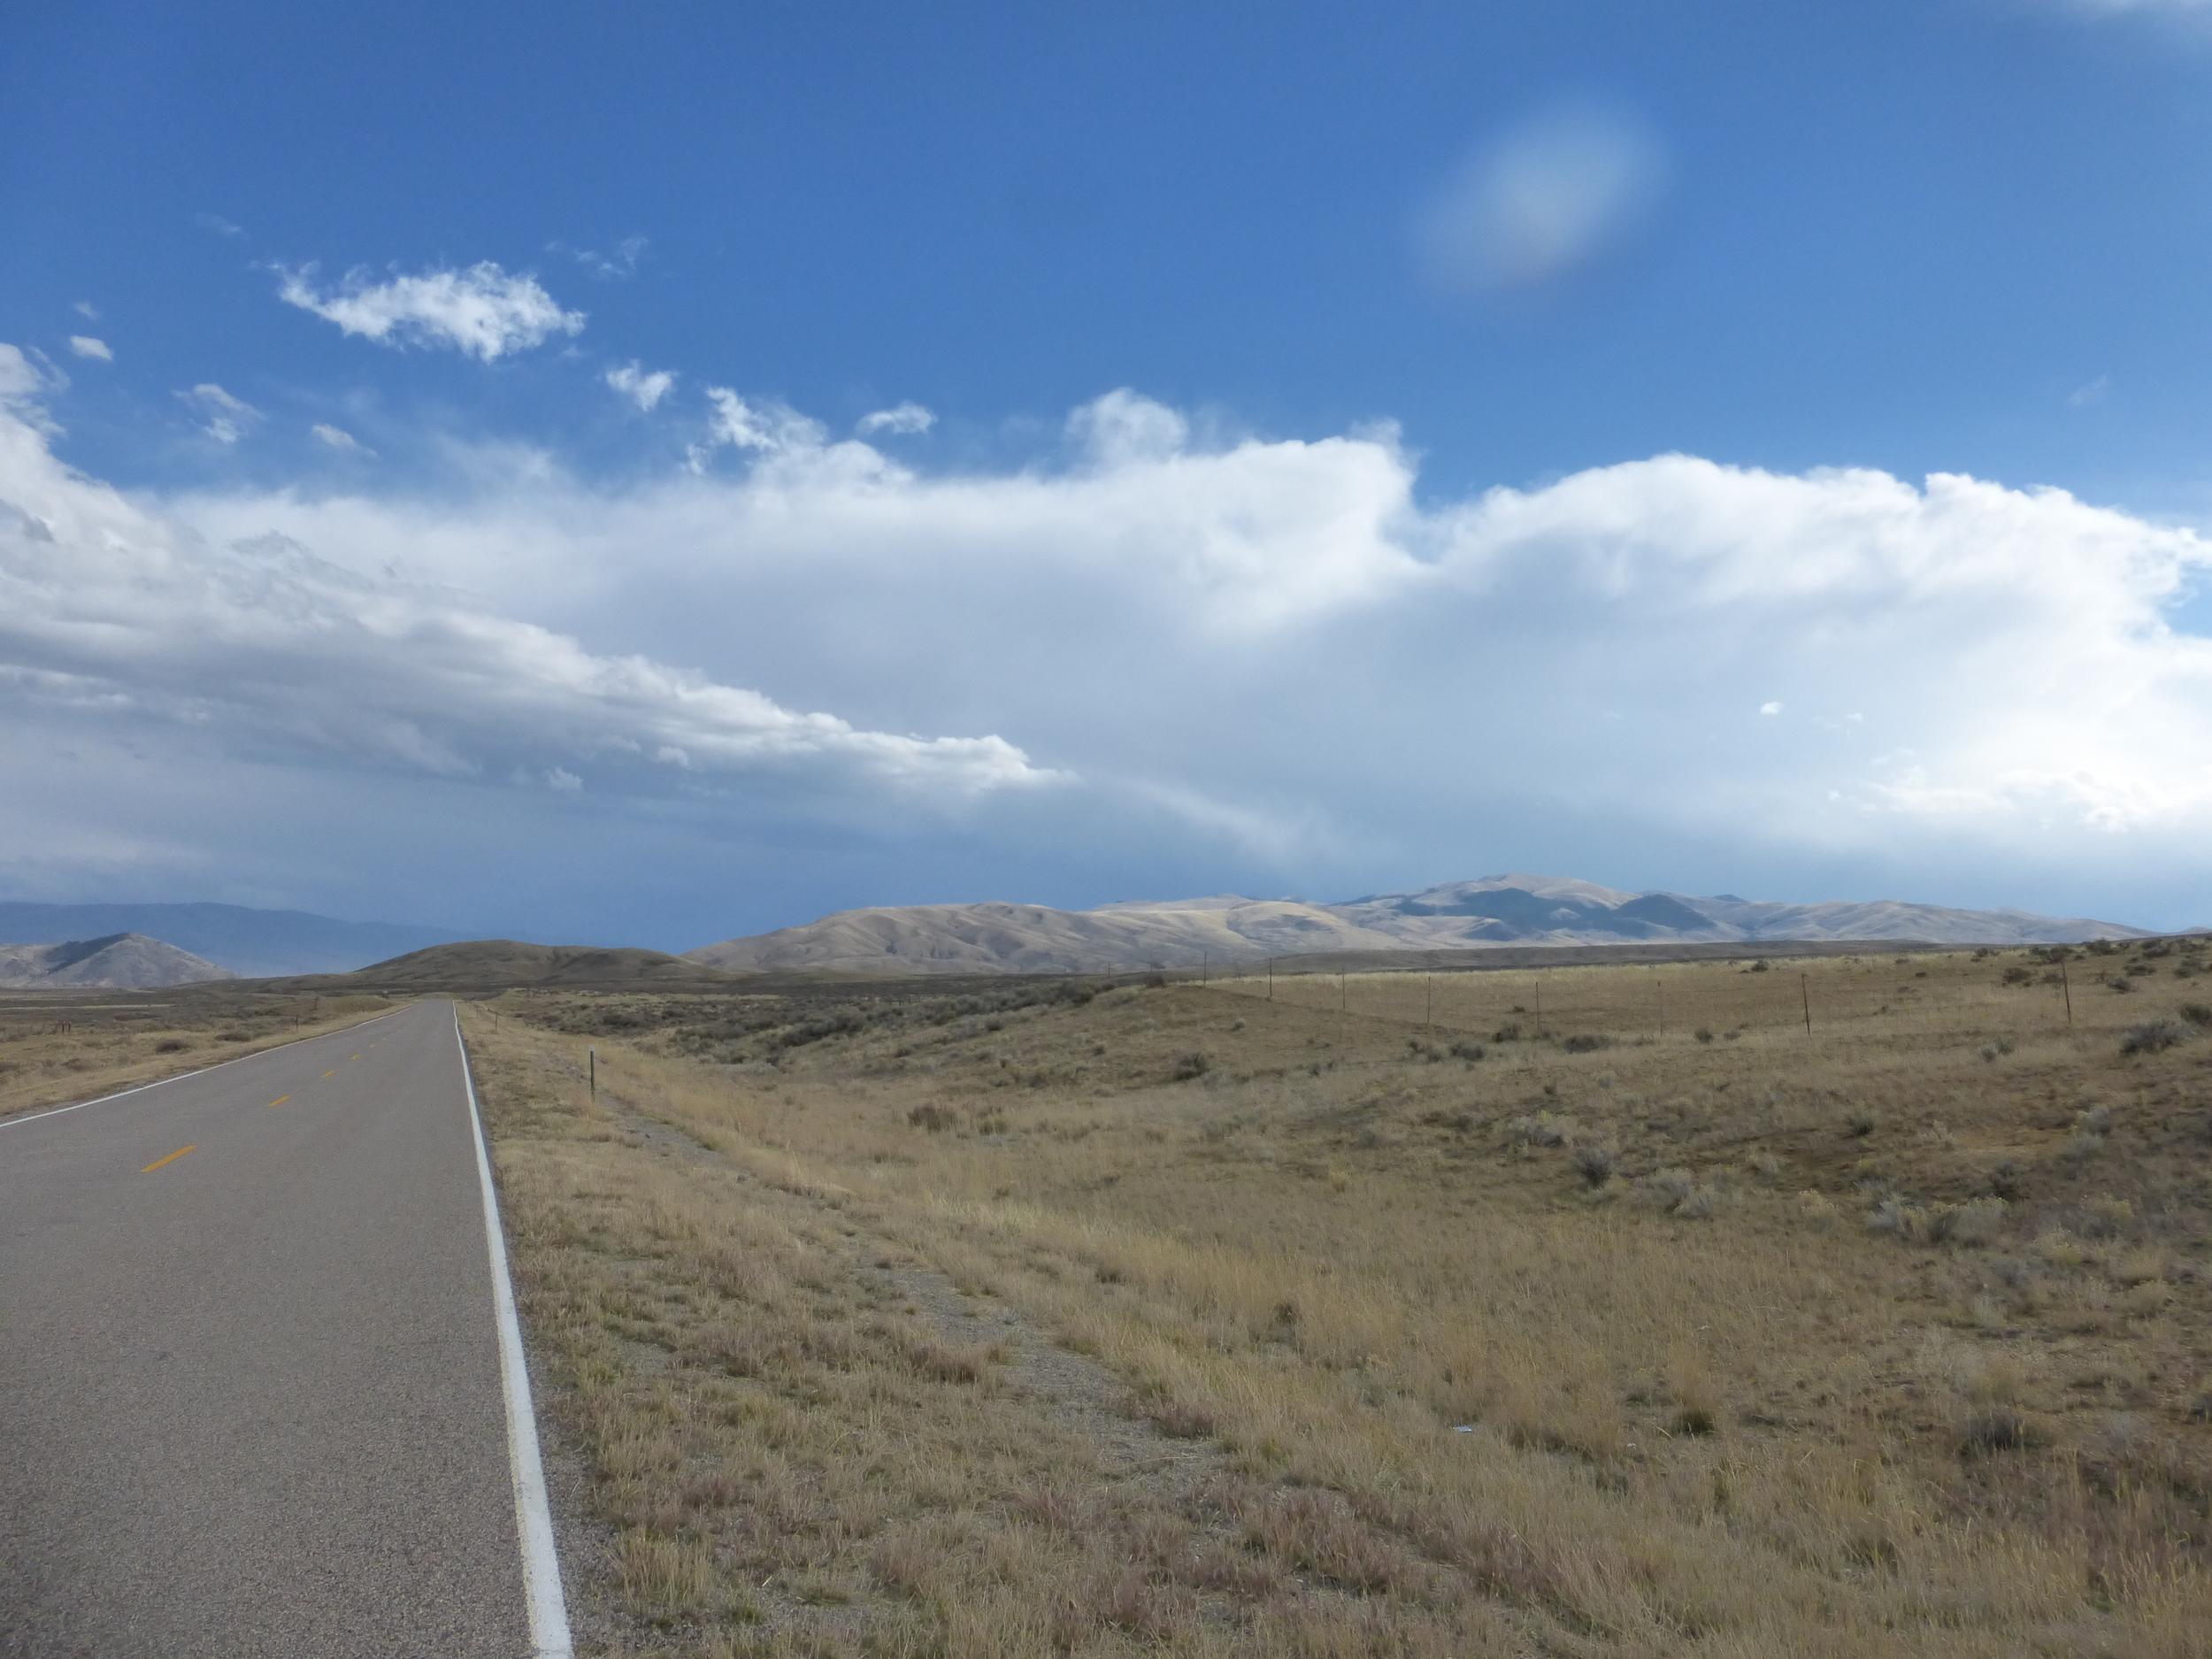 Still no rain or snow but the headwind was relentless.